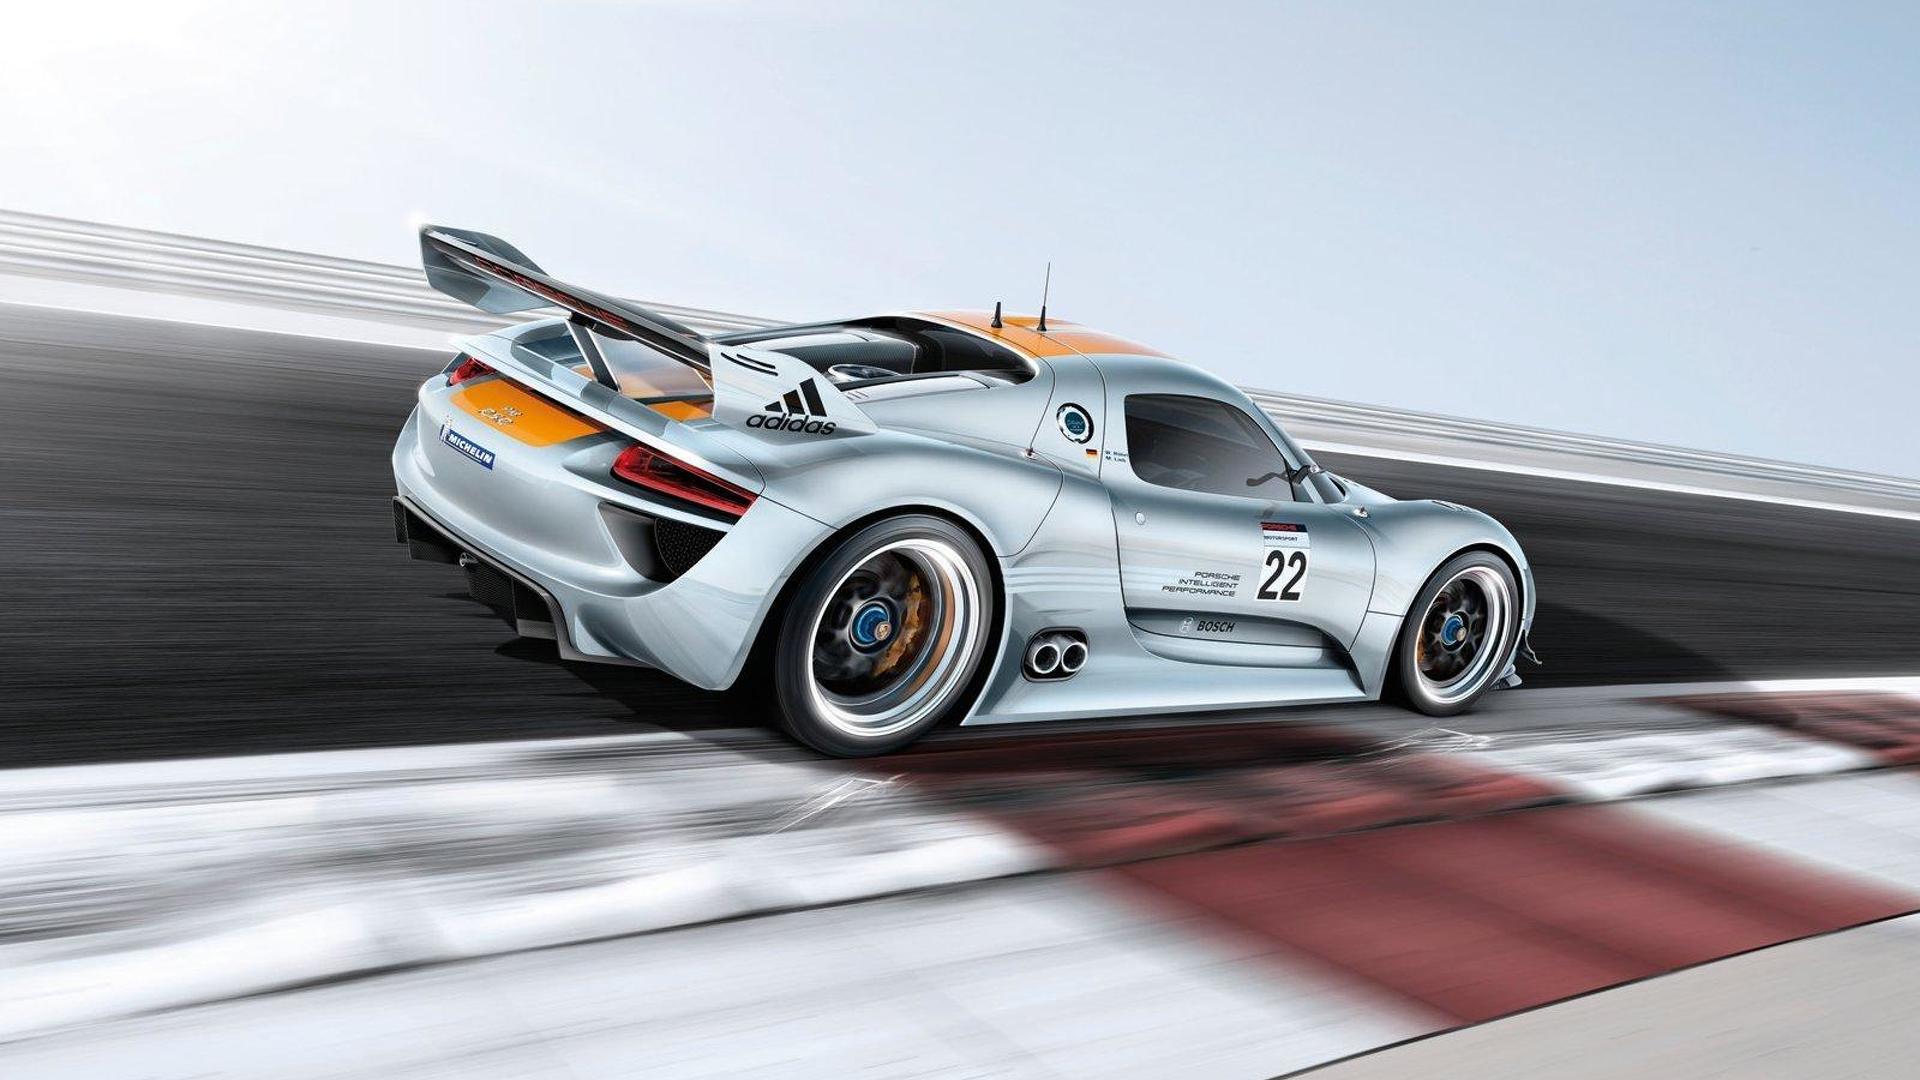 Porsche planing a new supercar - report